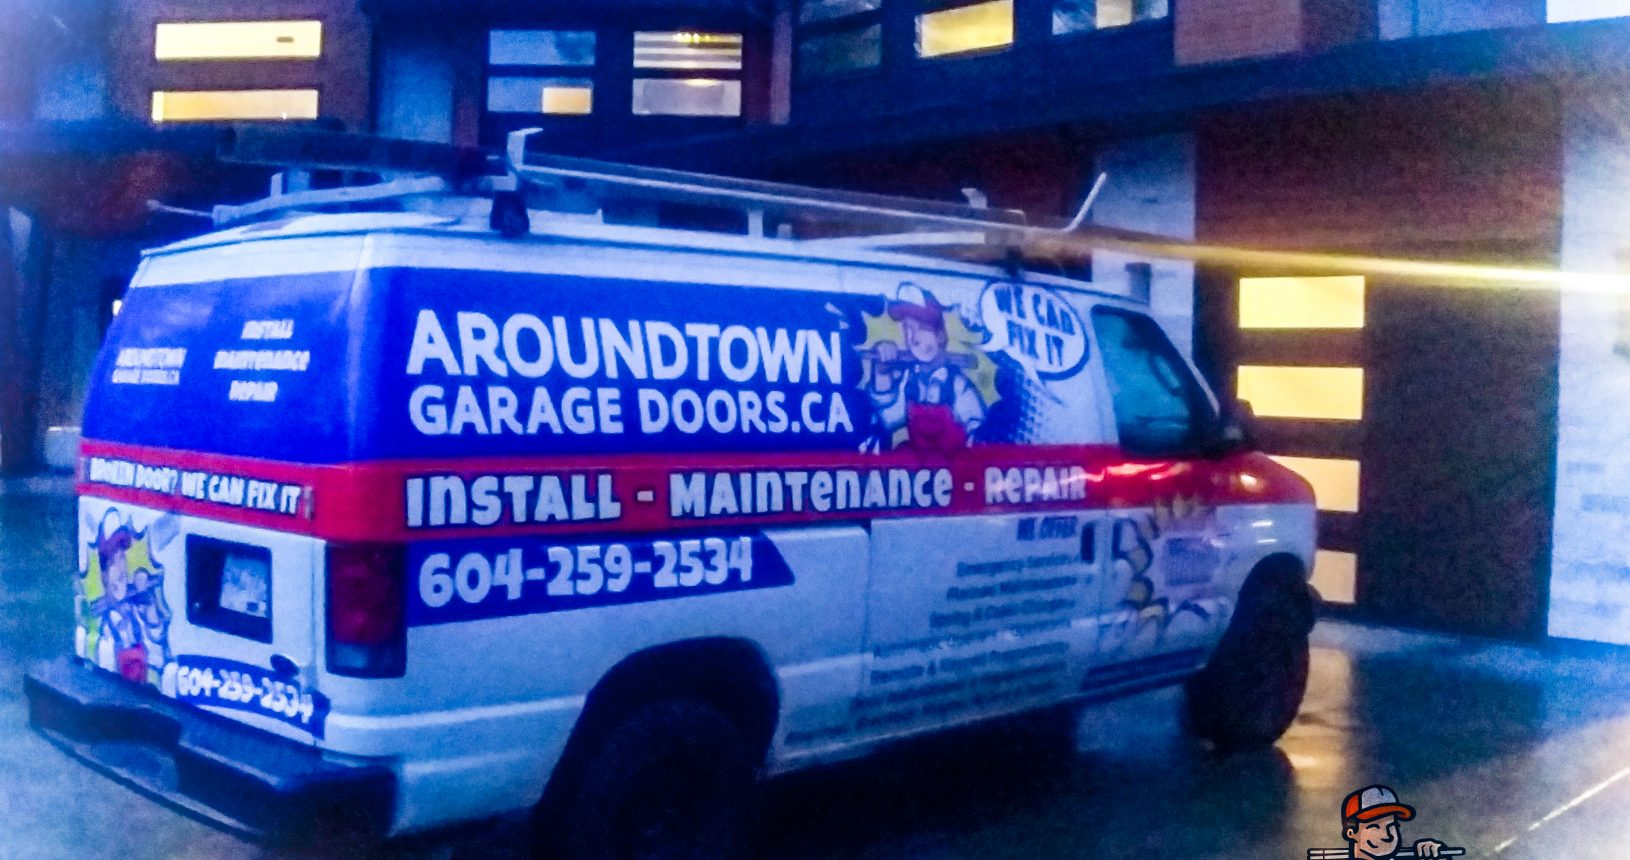 Aroundtown Garage Doors Ltd. - Service Call with Lenn Dolling - Serving Metro Vancouver - Richmond - Whiterock - Delta - Surrey - North Vancouver - Burnaby - Maple Ridge